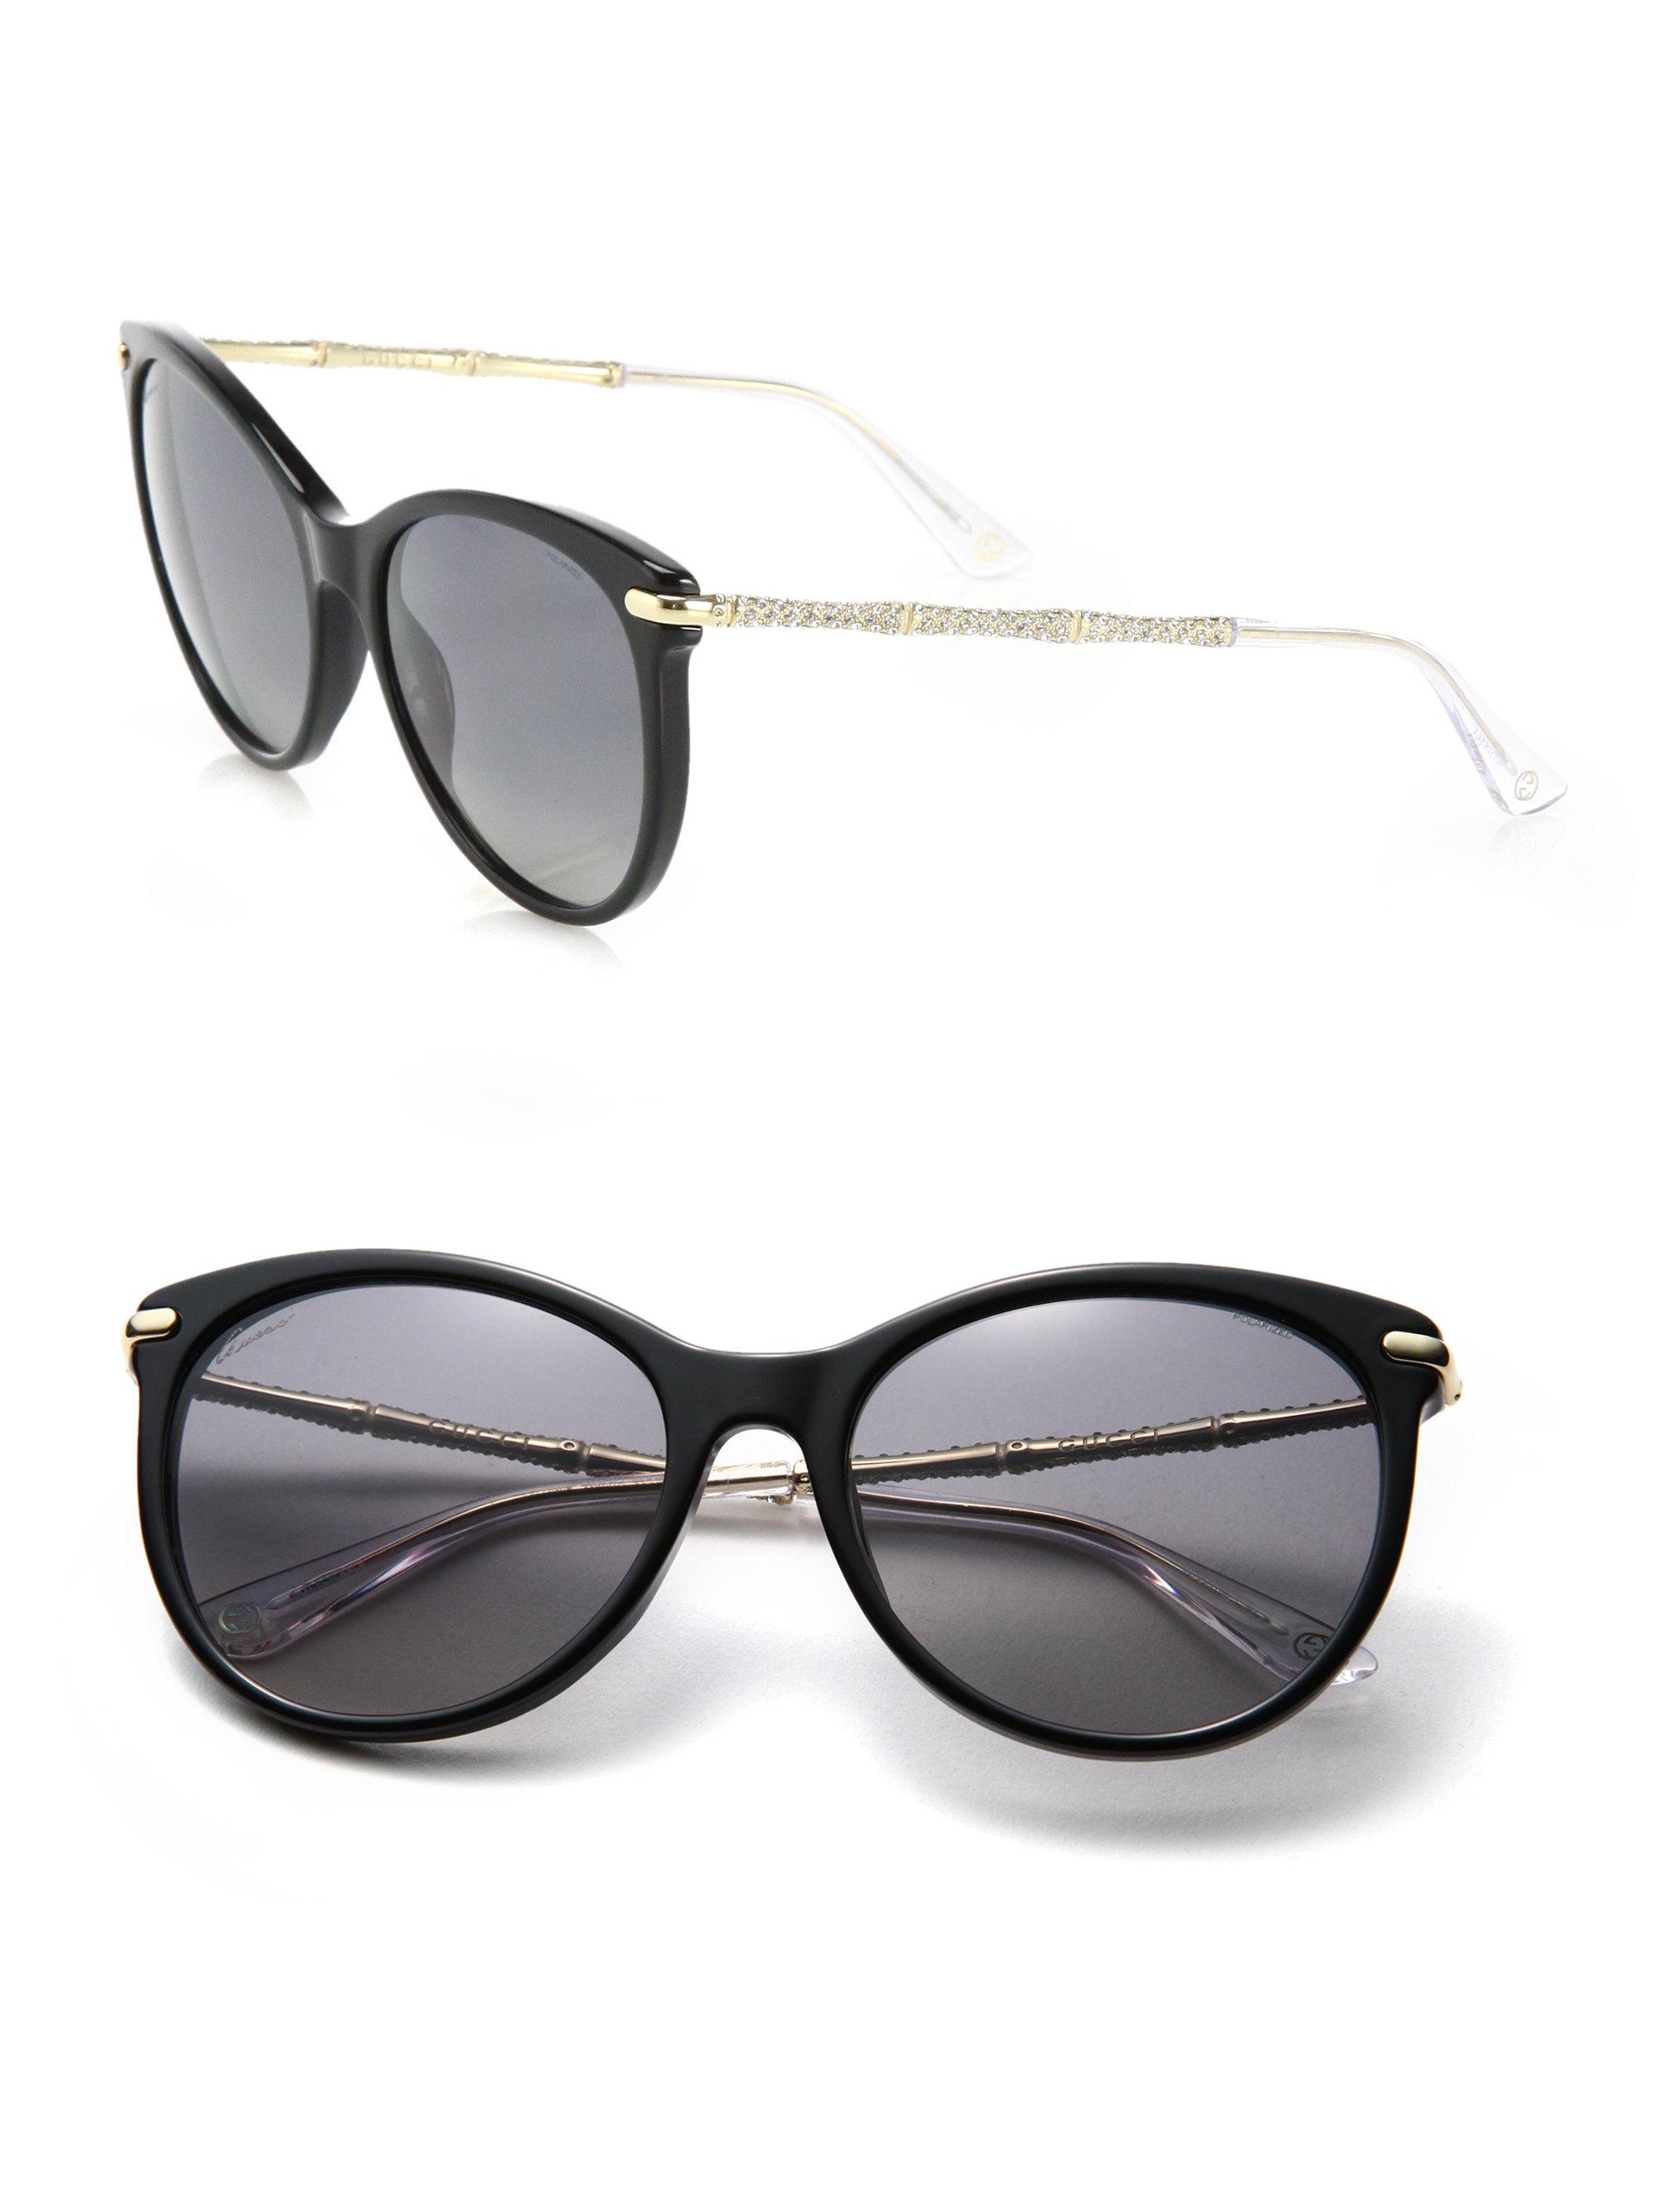 cat eye shaped sunglasses - Black Gucci nfn5r0